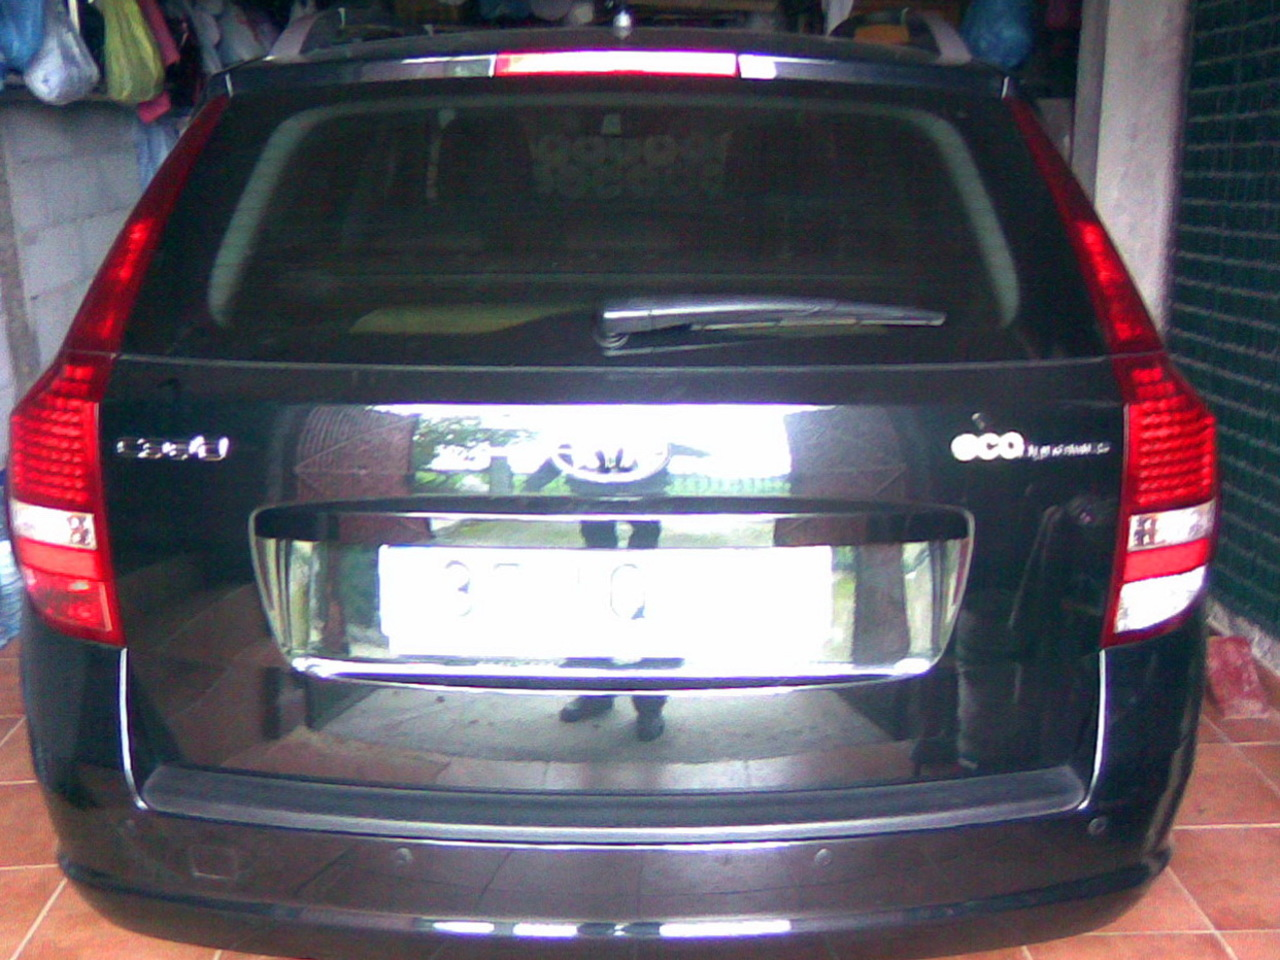 Kia Venga 1.4CRDI TX 90cv e Kia Cee`d SW 1.6 CRDI  TX 115cv Img005